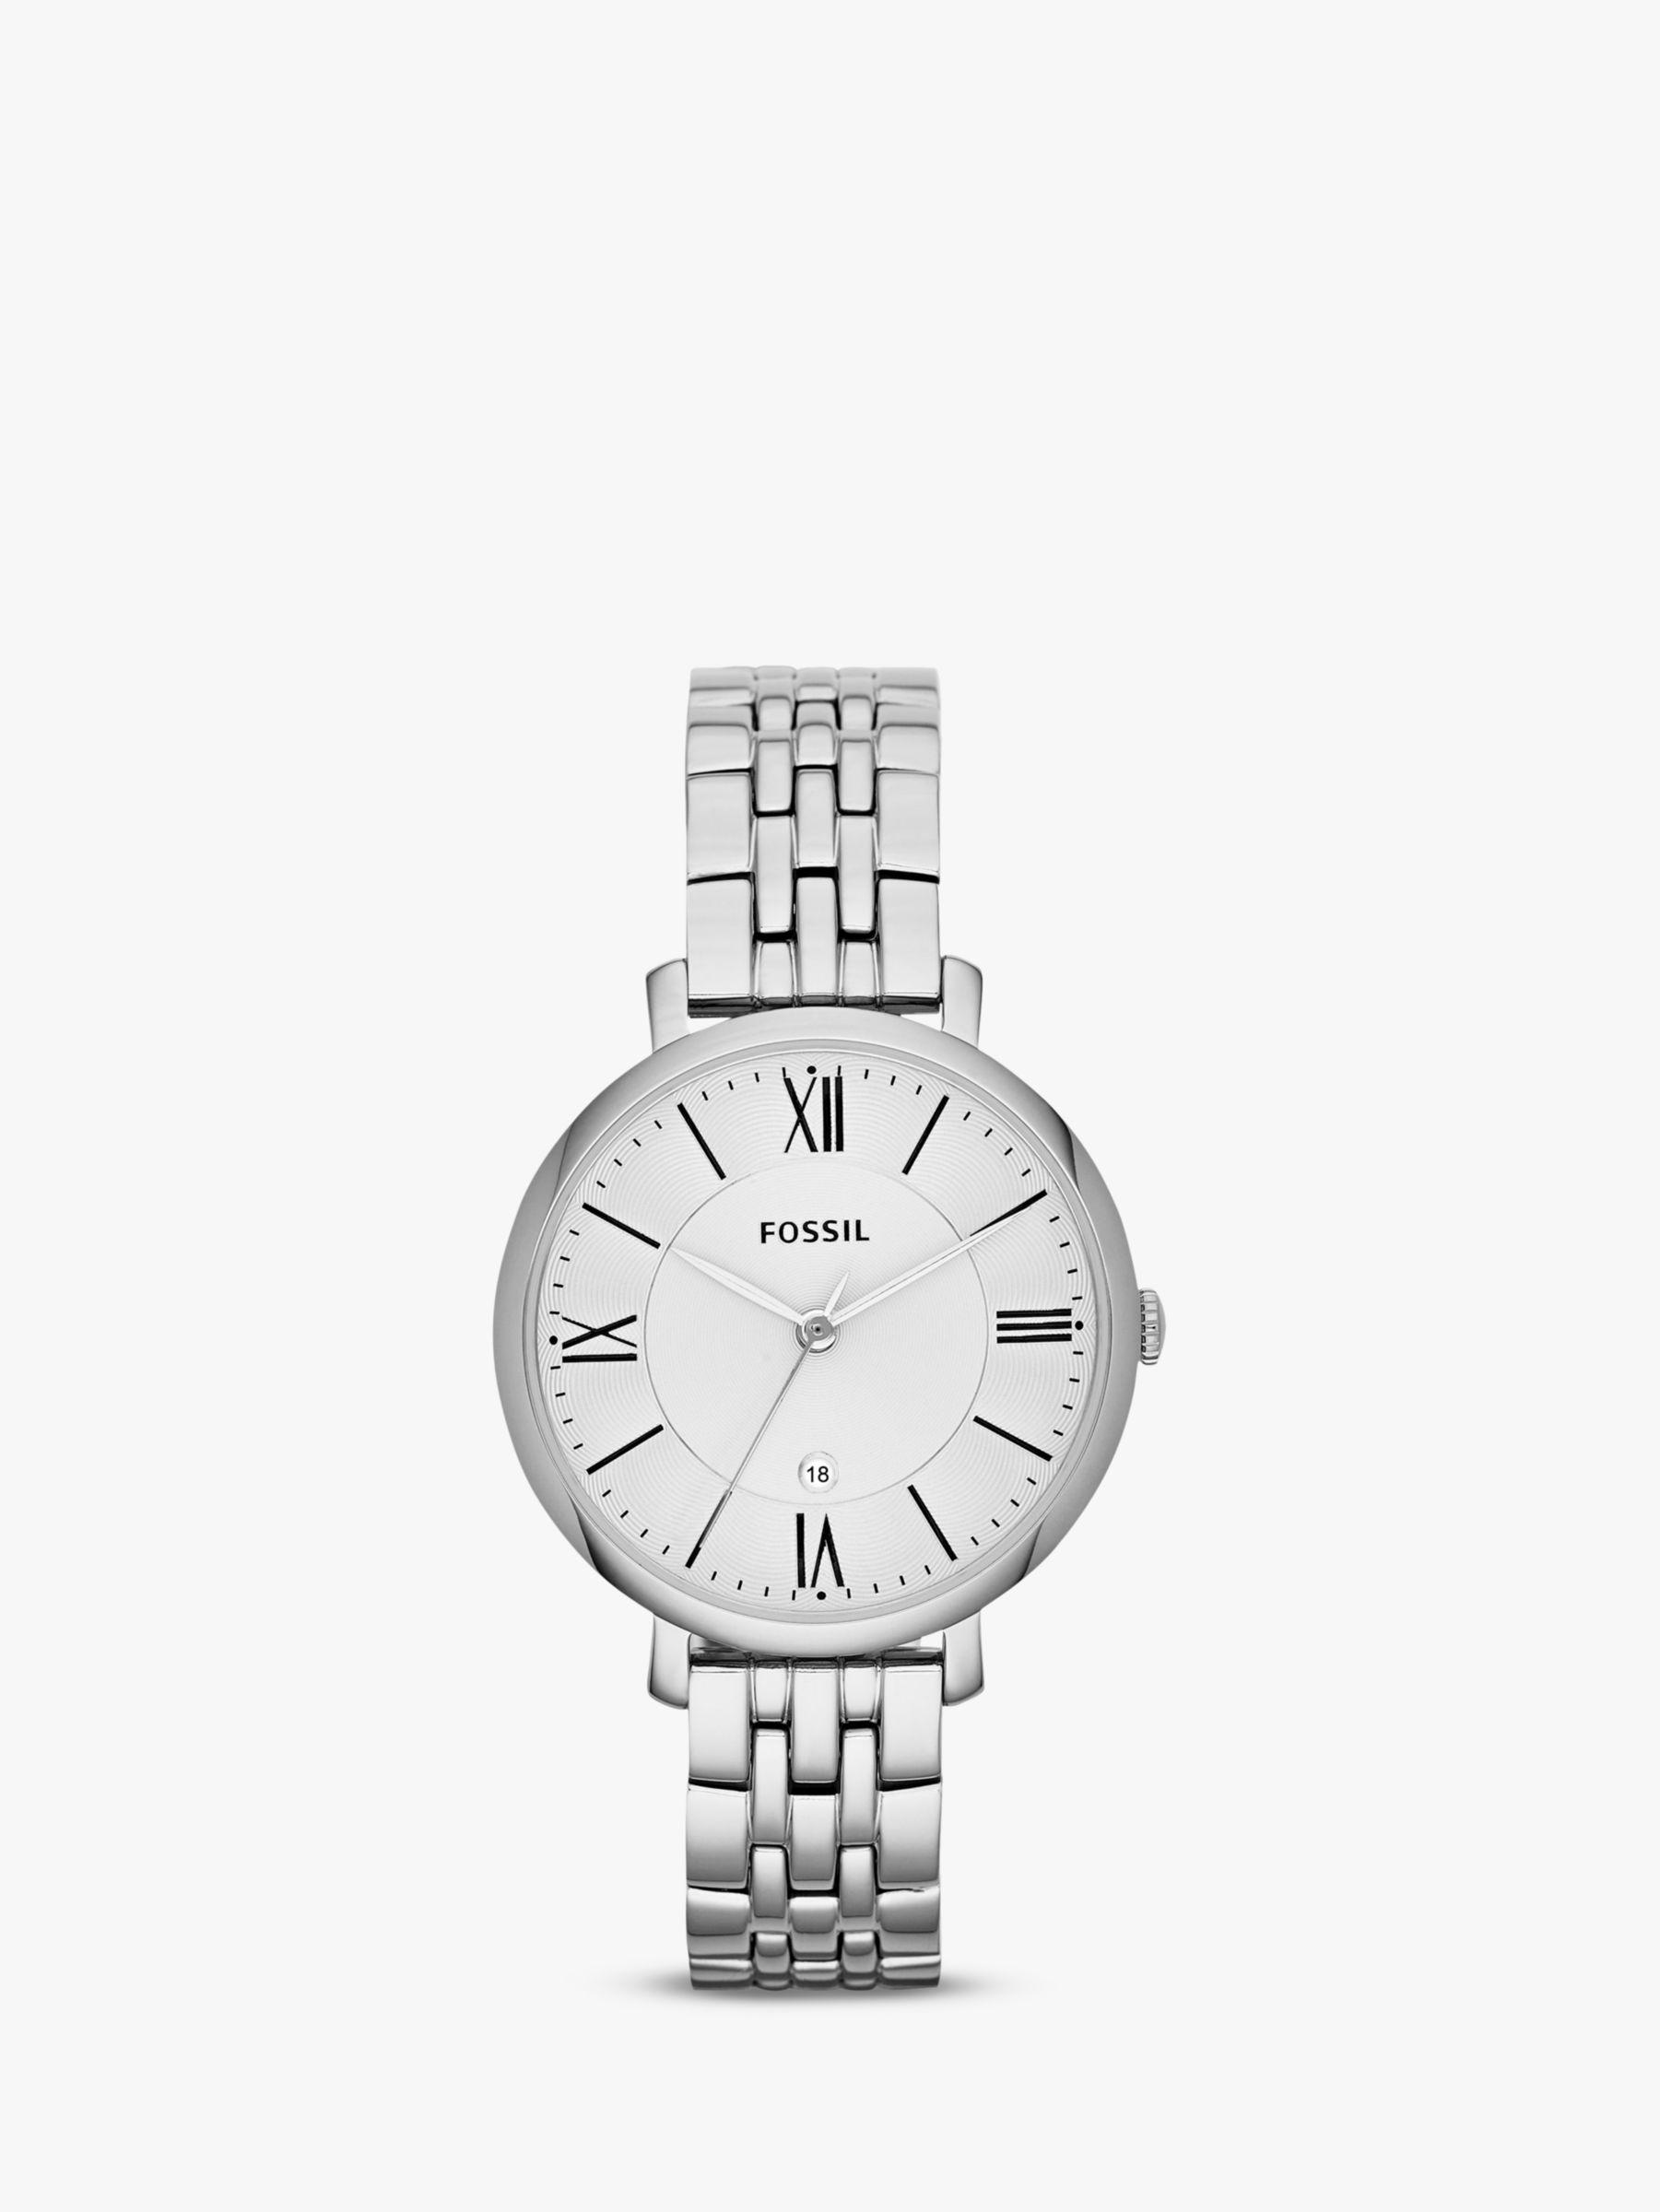 Fossil Fossil ES3433 Women's Jacqueline Bracelet Strap Watch, Silver/White